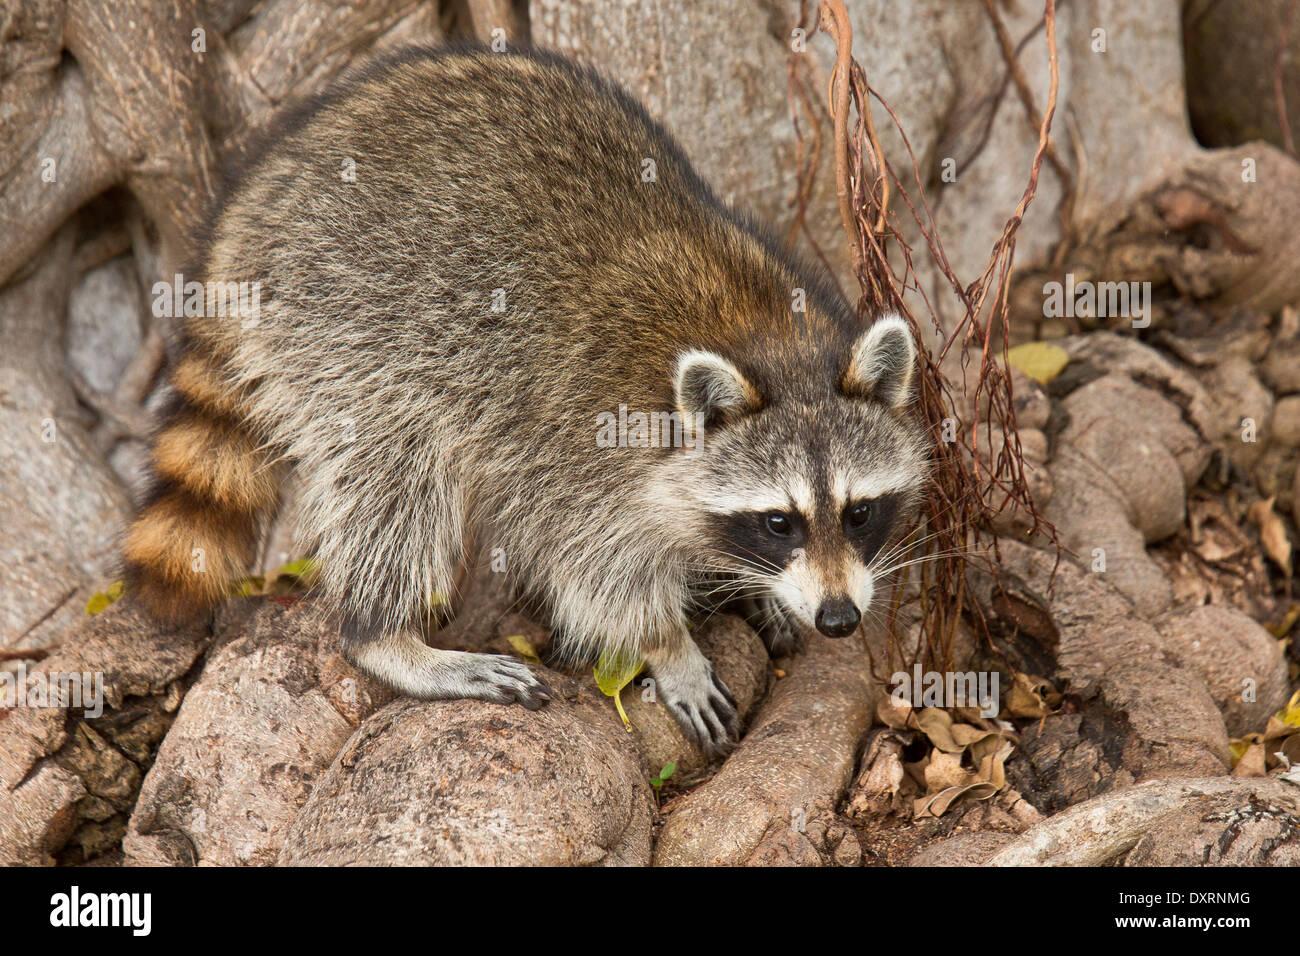 Mapache Procyon lotor o racoon, buscando comida entre las raíces del árbol; Everglades, Florida. Imagen De Stock